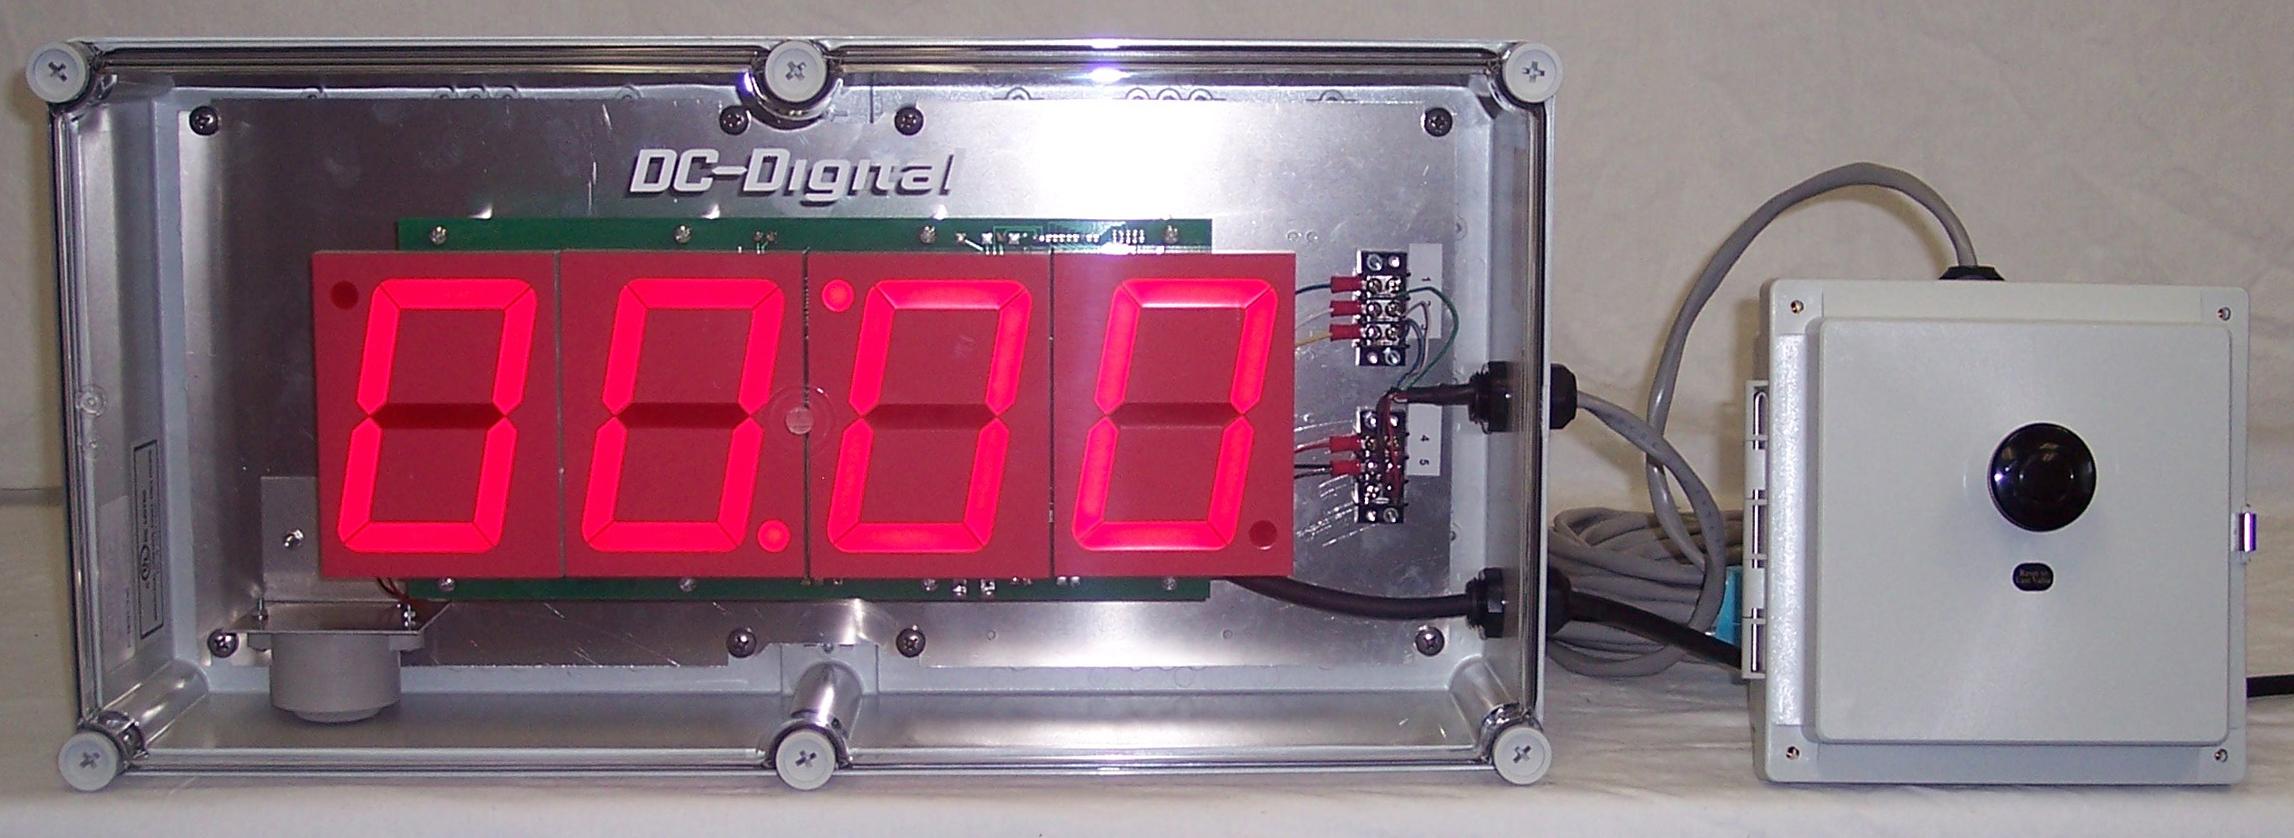 (DC-40T-DN-BCD-EOP-Nema)-Set-n-Forget-Countdown-Timer-4-Inch-Digit-Nema-Ecl